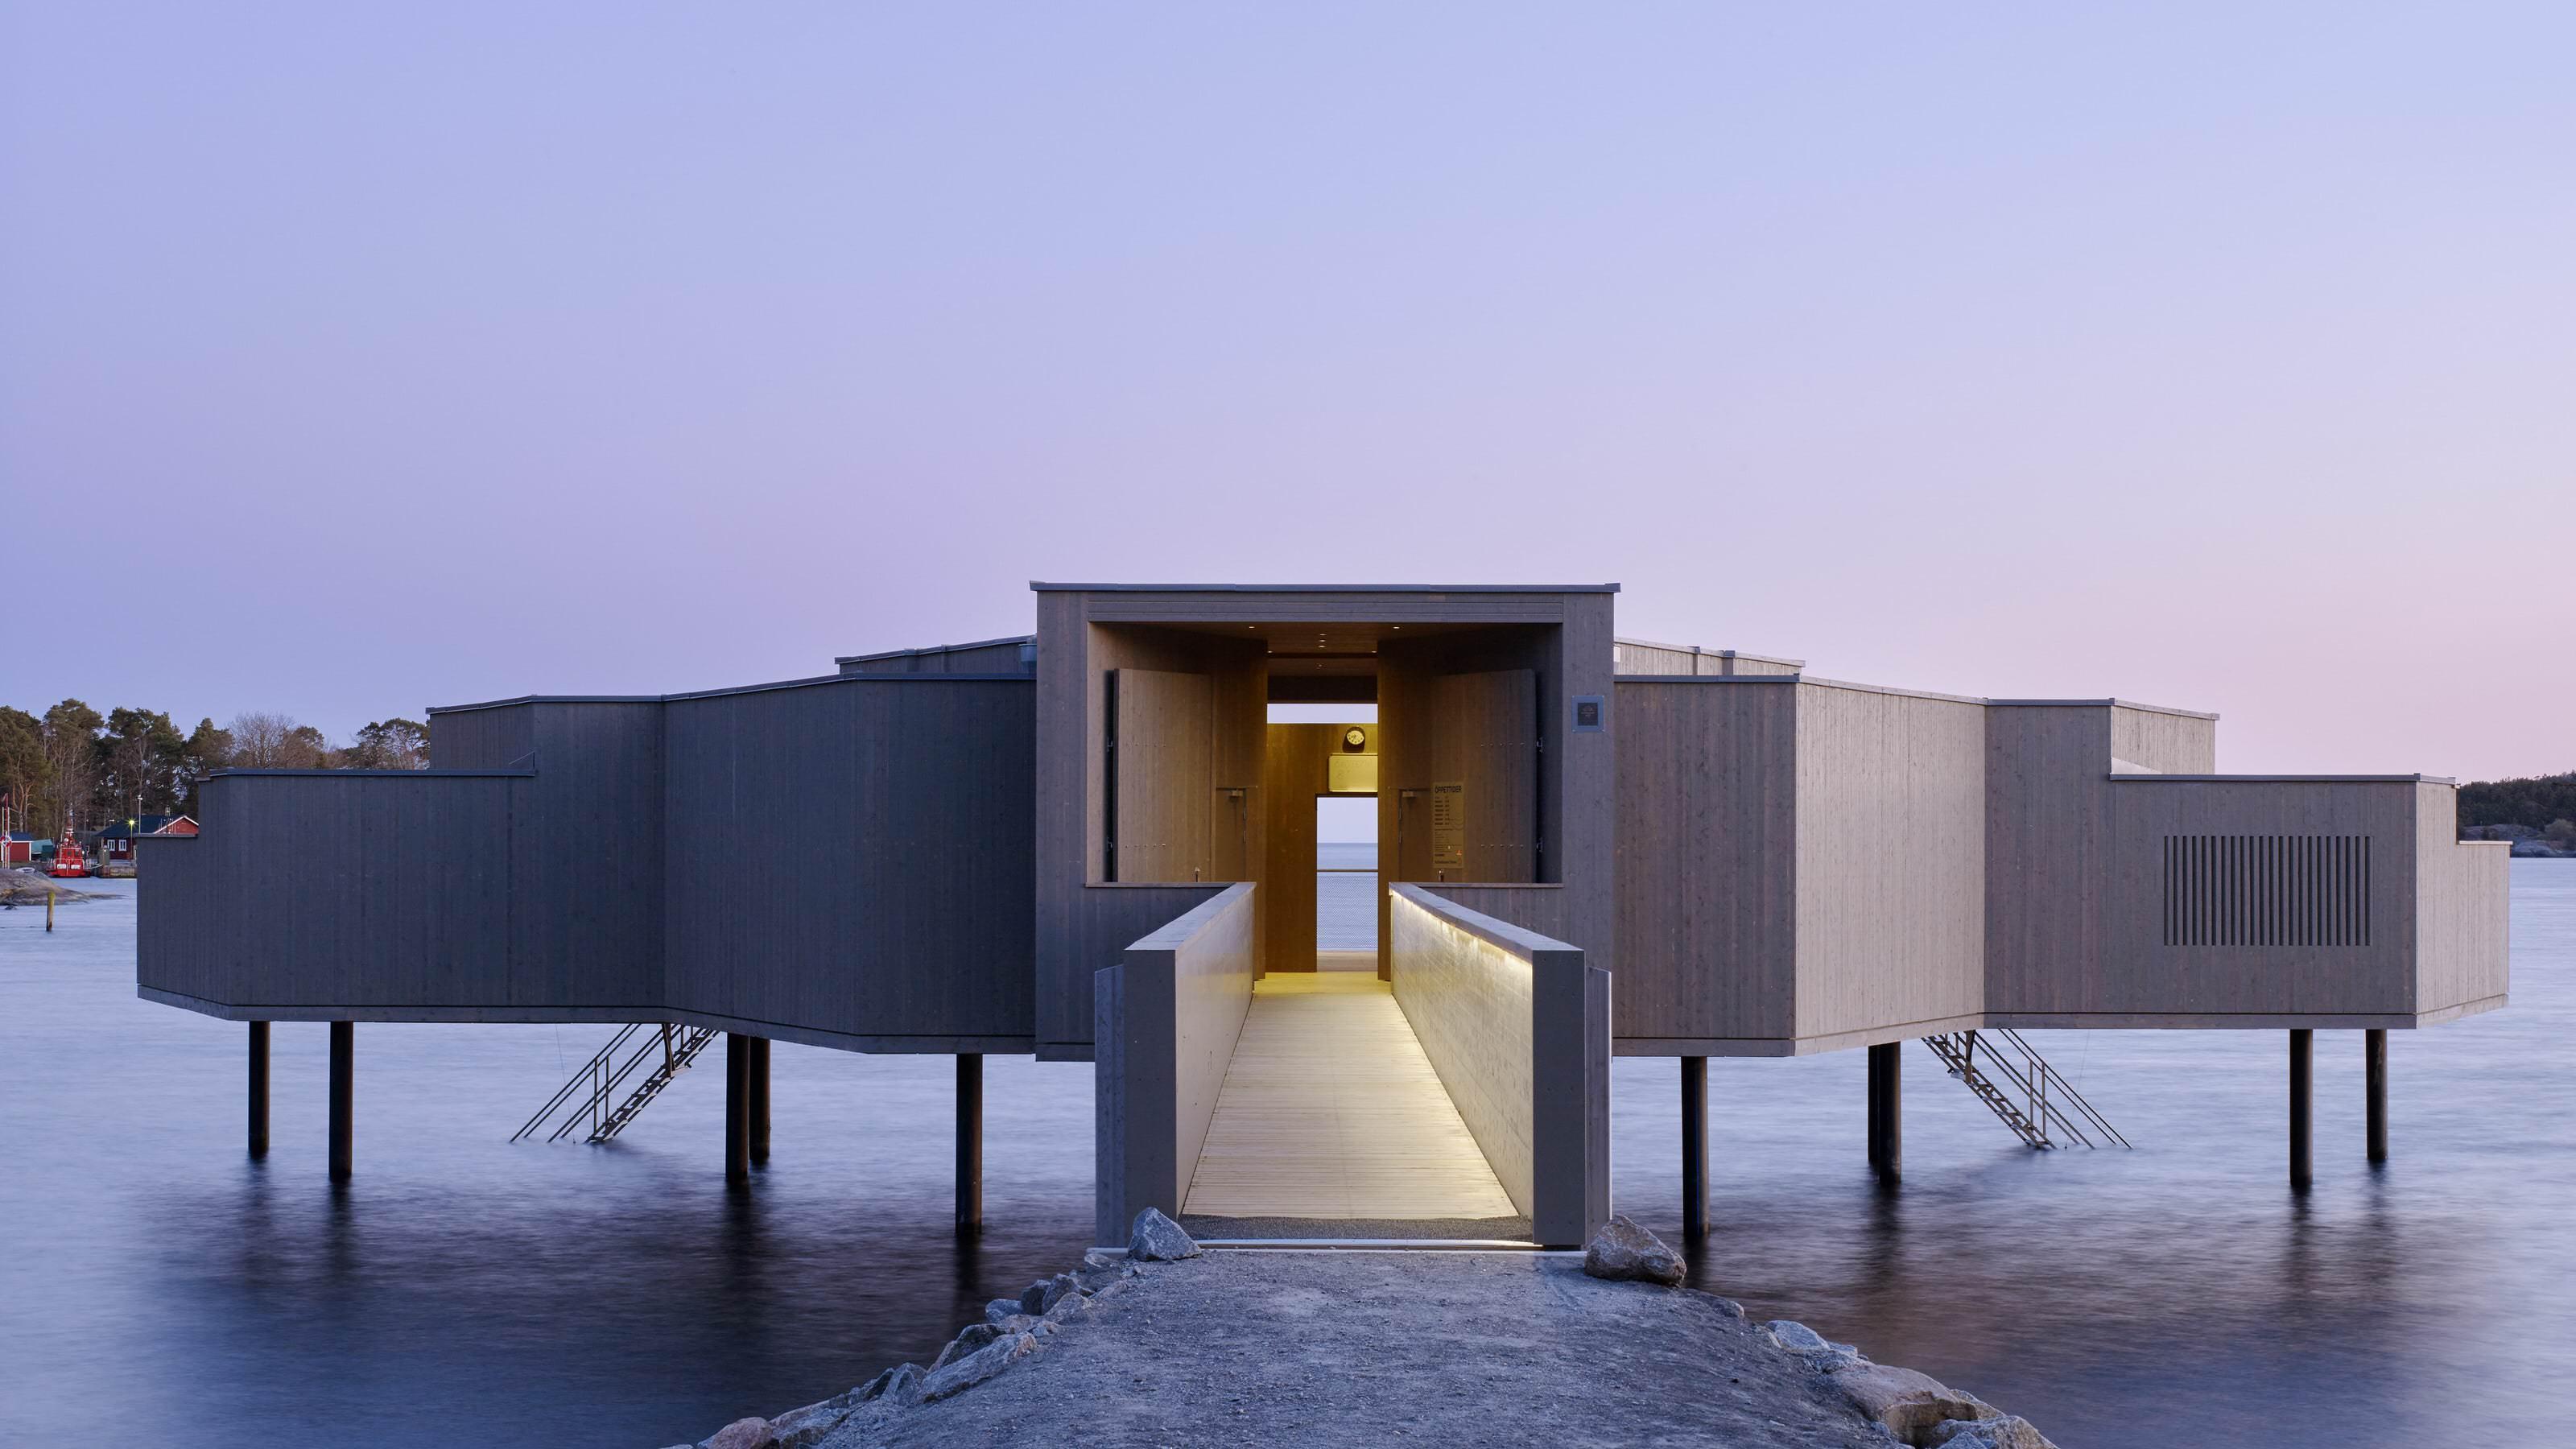 Karlshamns Kallbadhus — A new take on the bath house | White Arkitekter